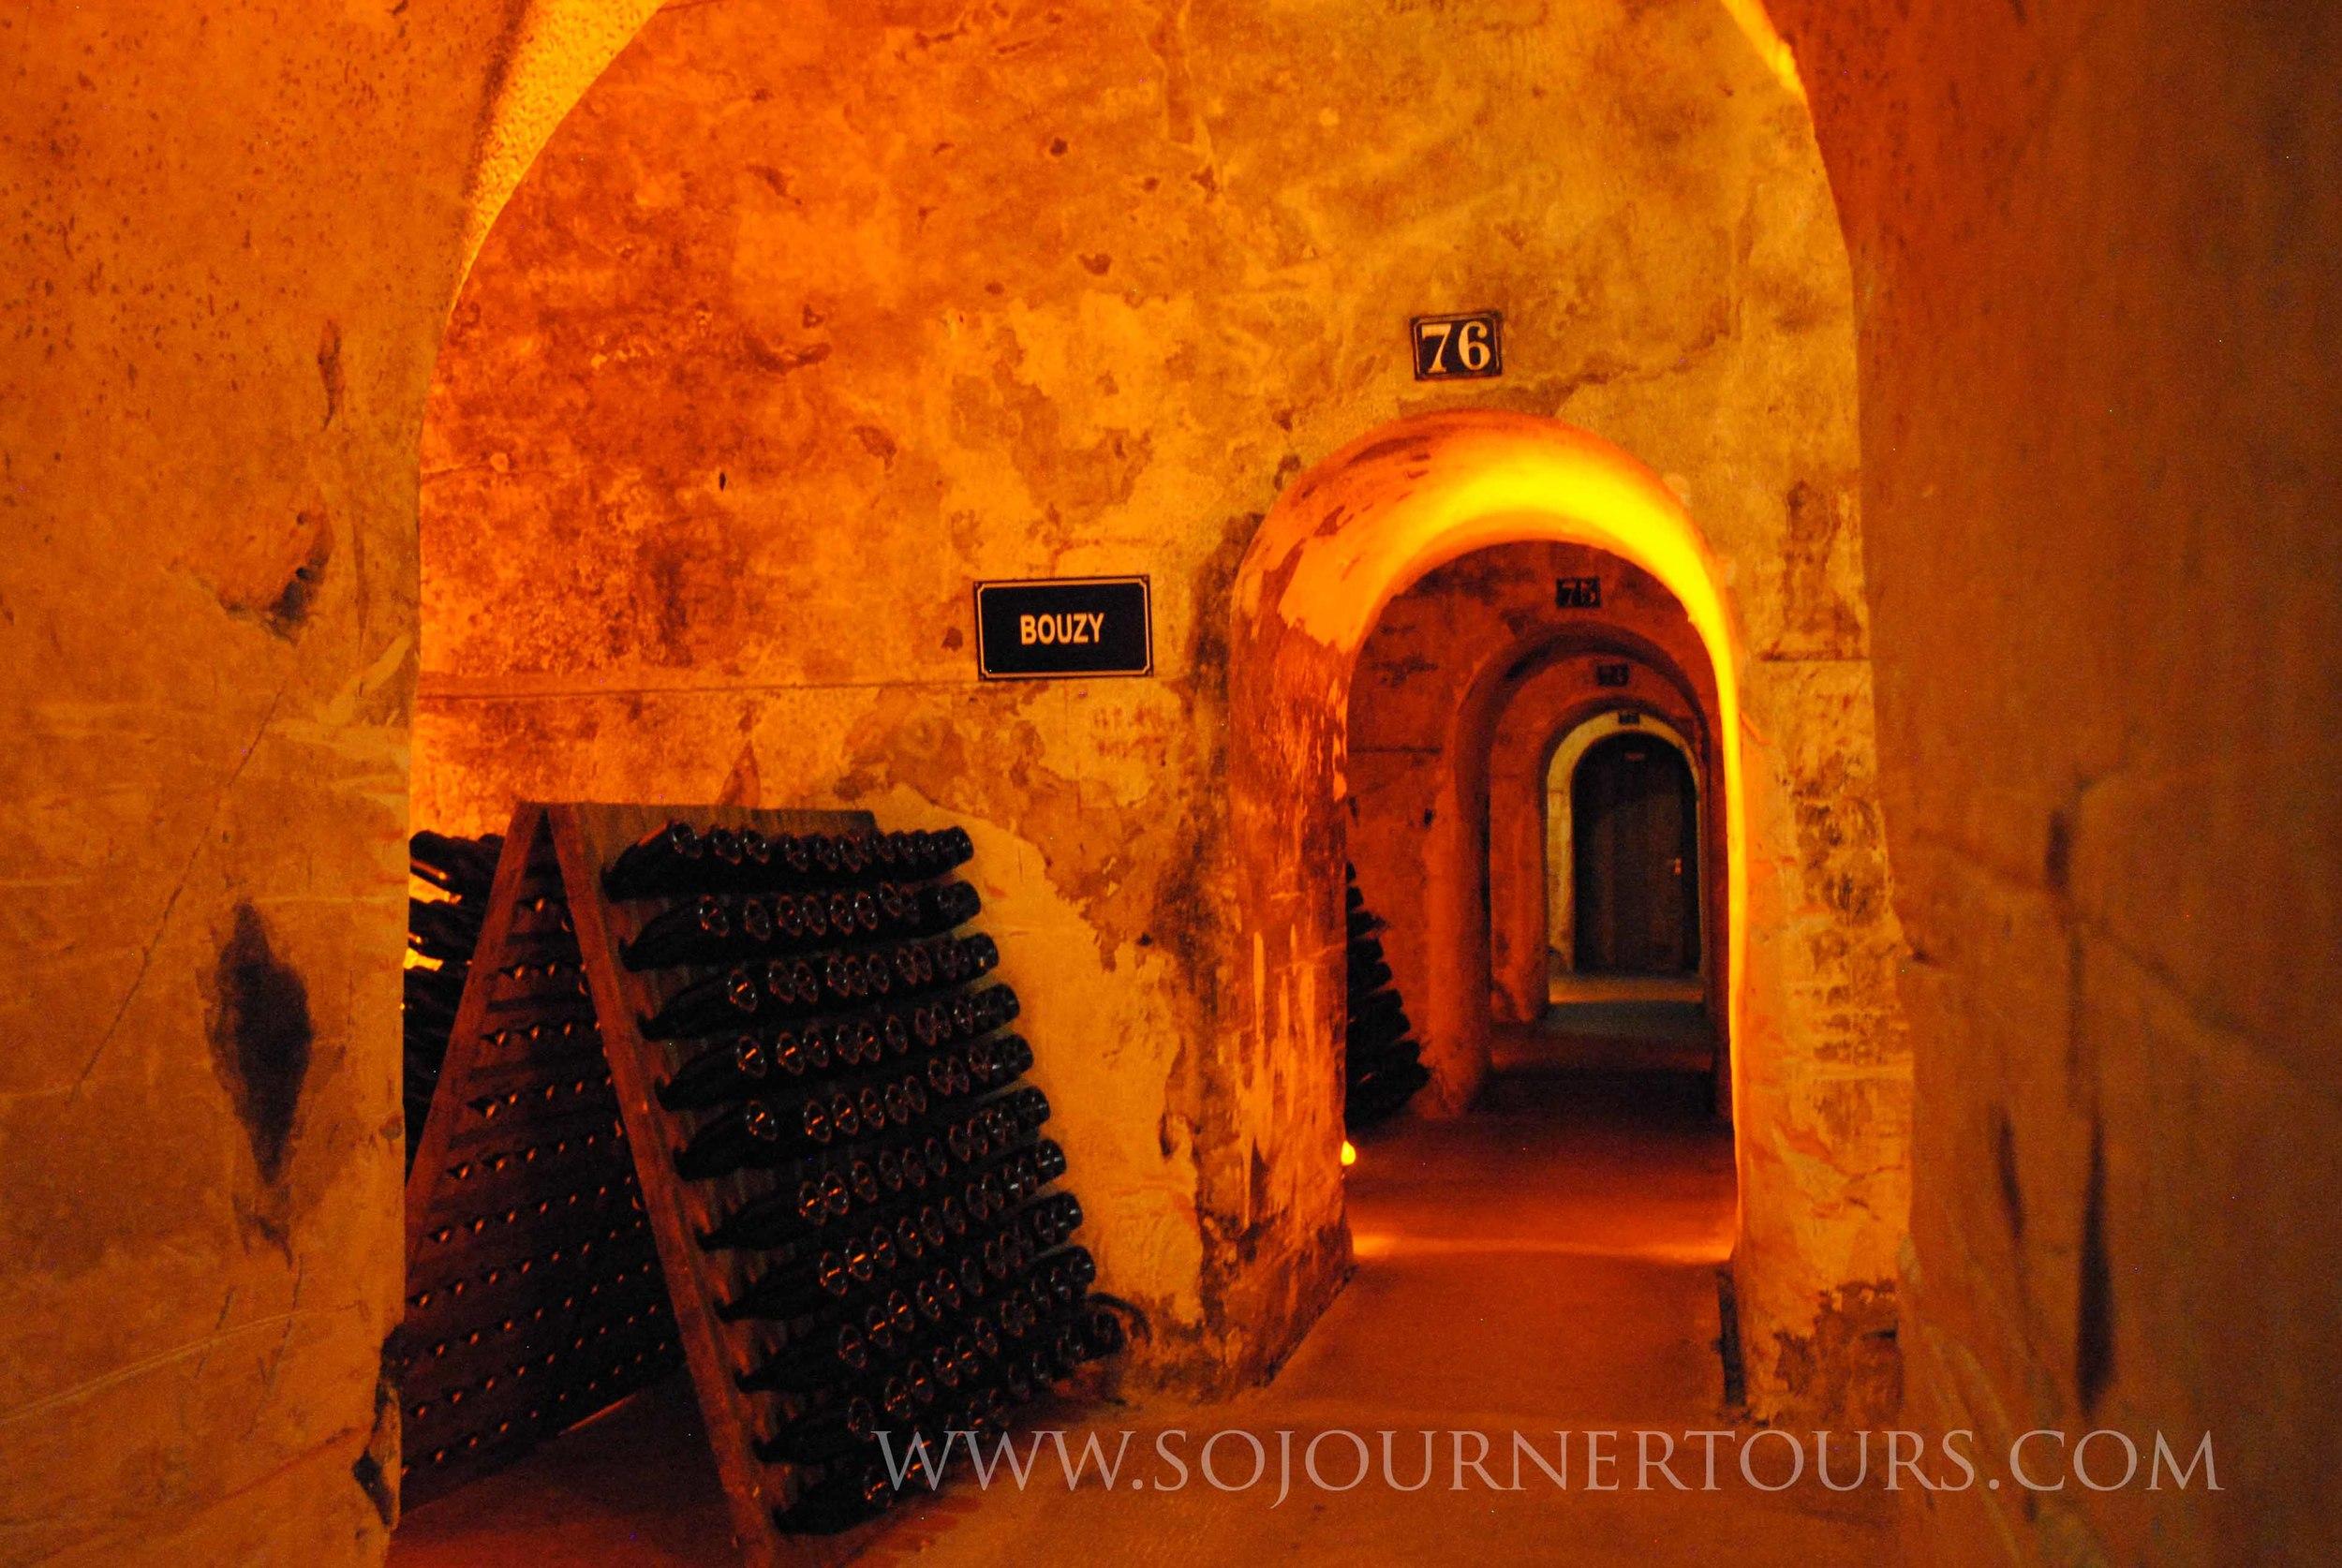 Veuve Clicquot: Reims, France (Sojourner Tours)